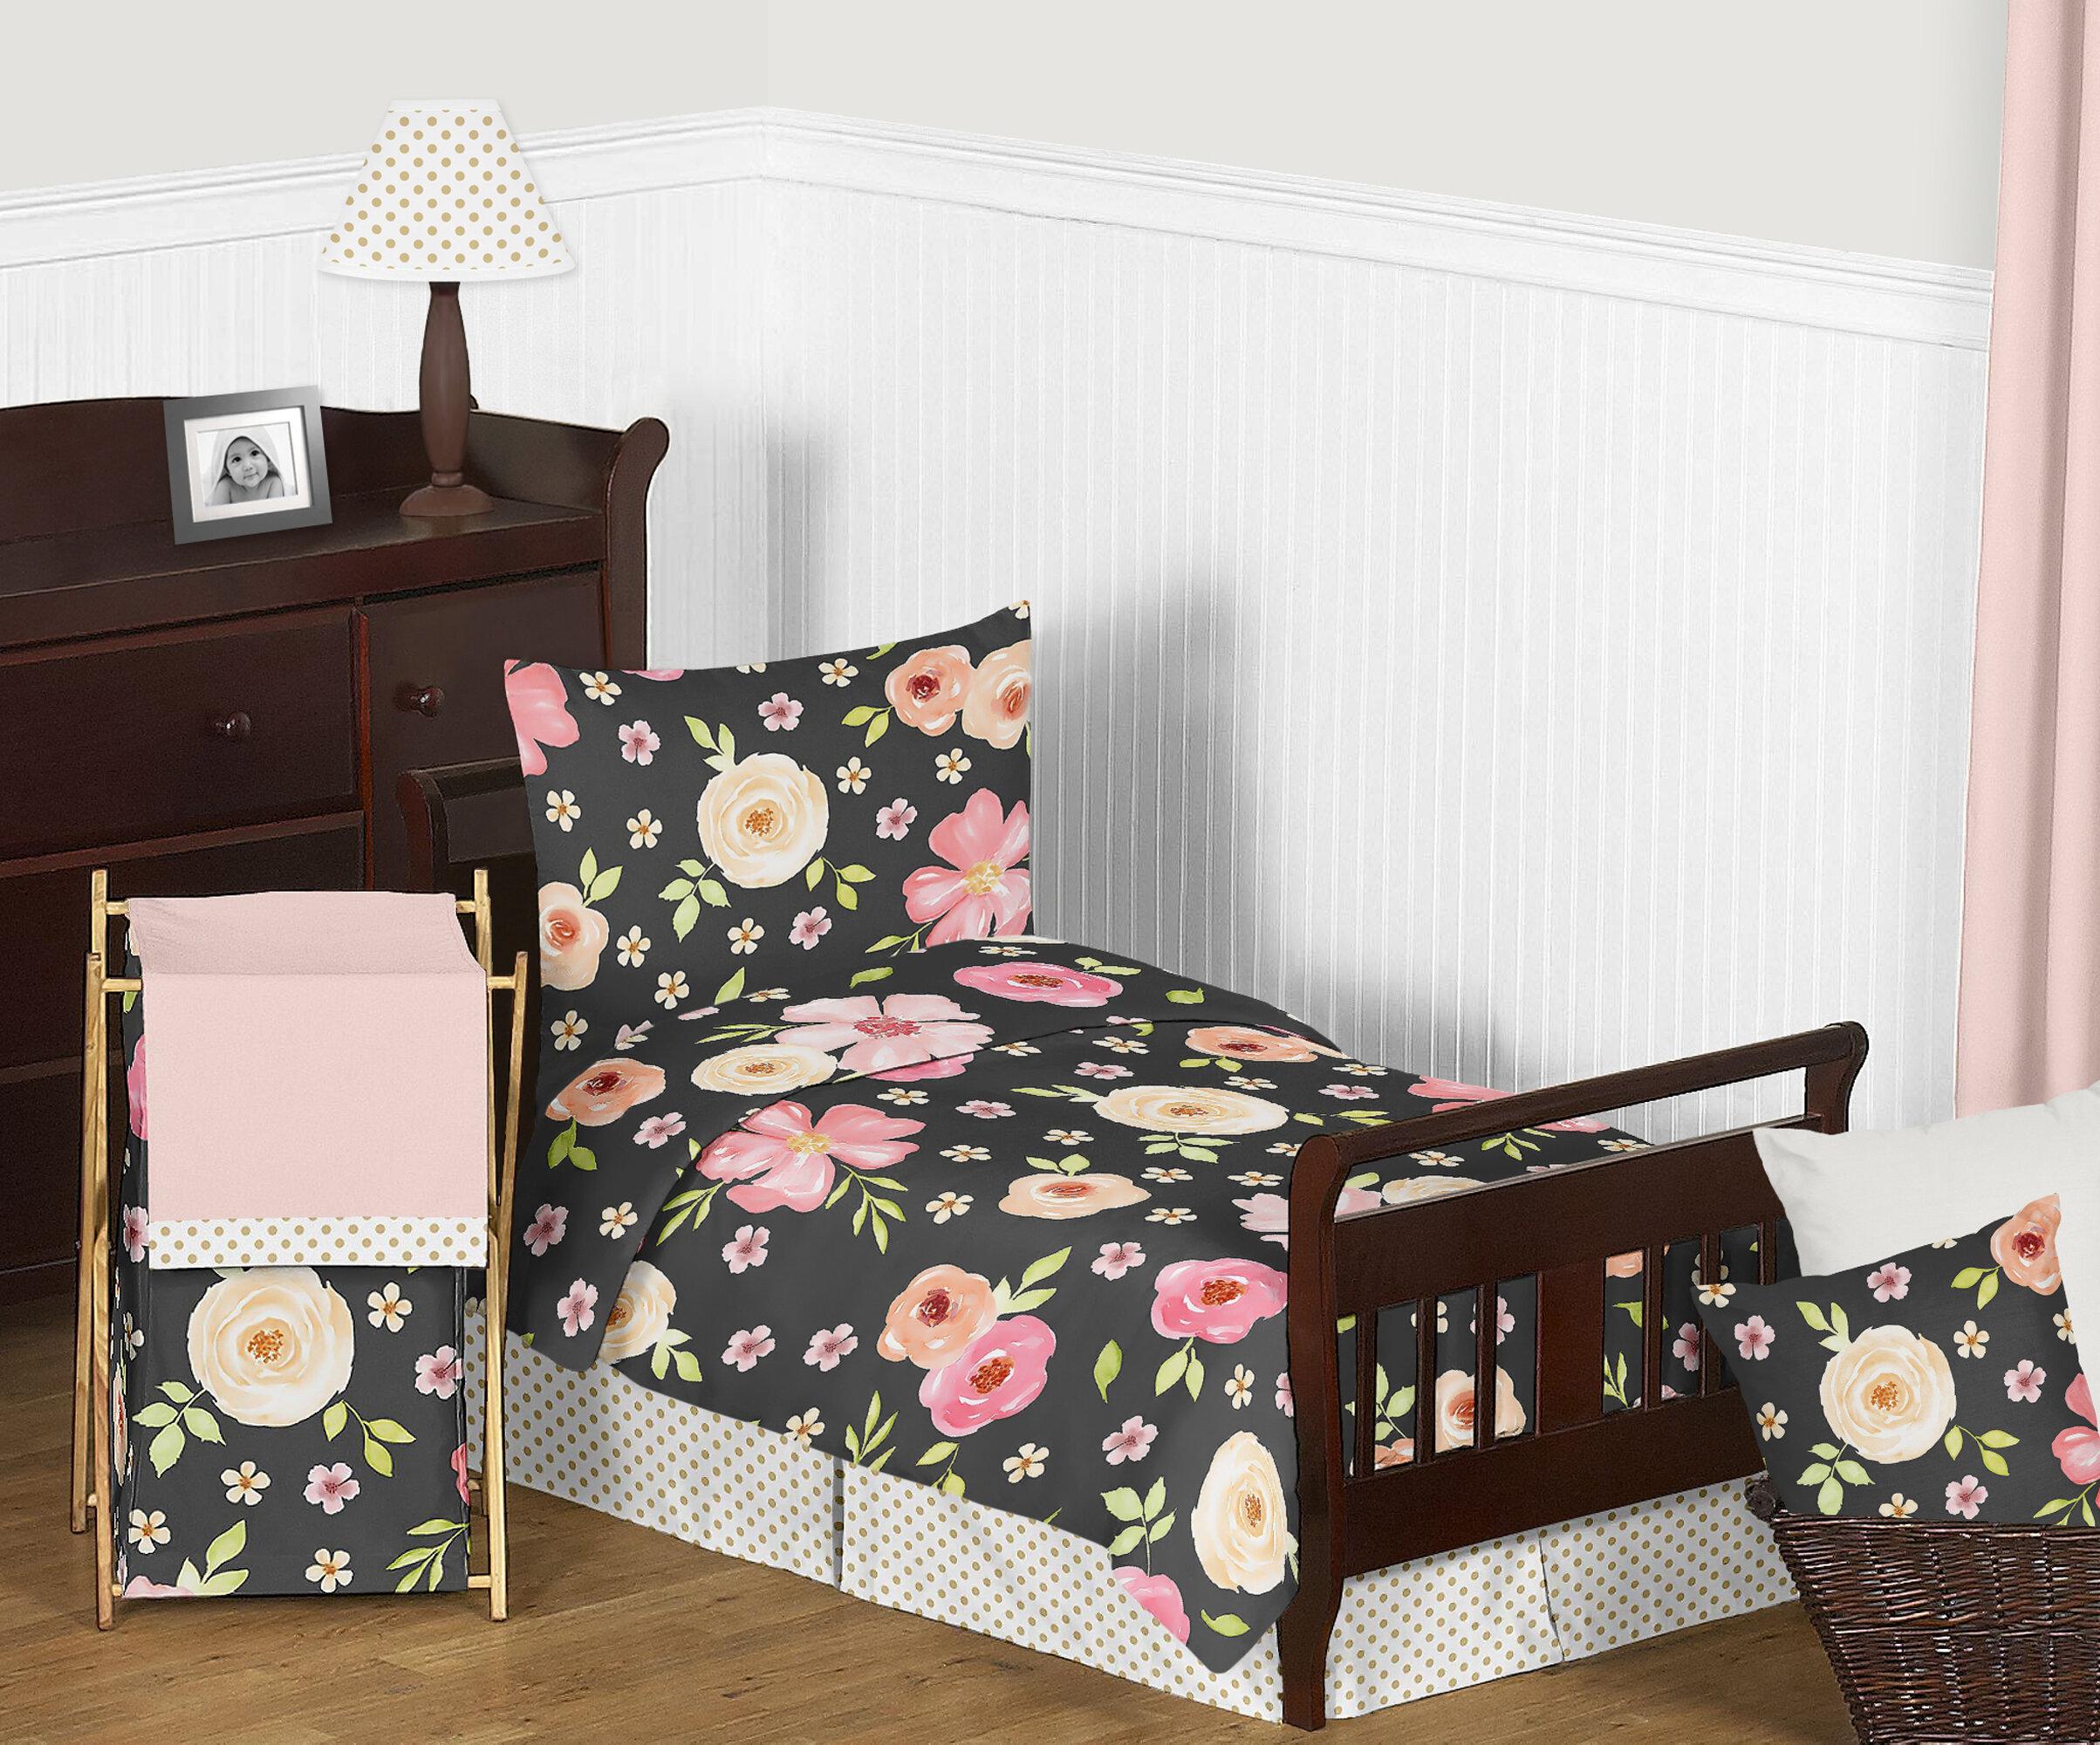 Sweet Jojo Designs Watercolor Floral 5 Piece Toddler Bedding Set